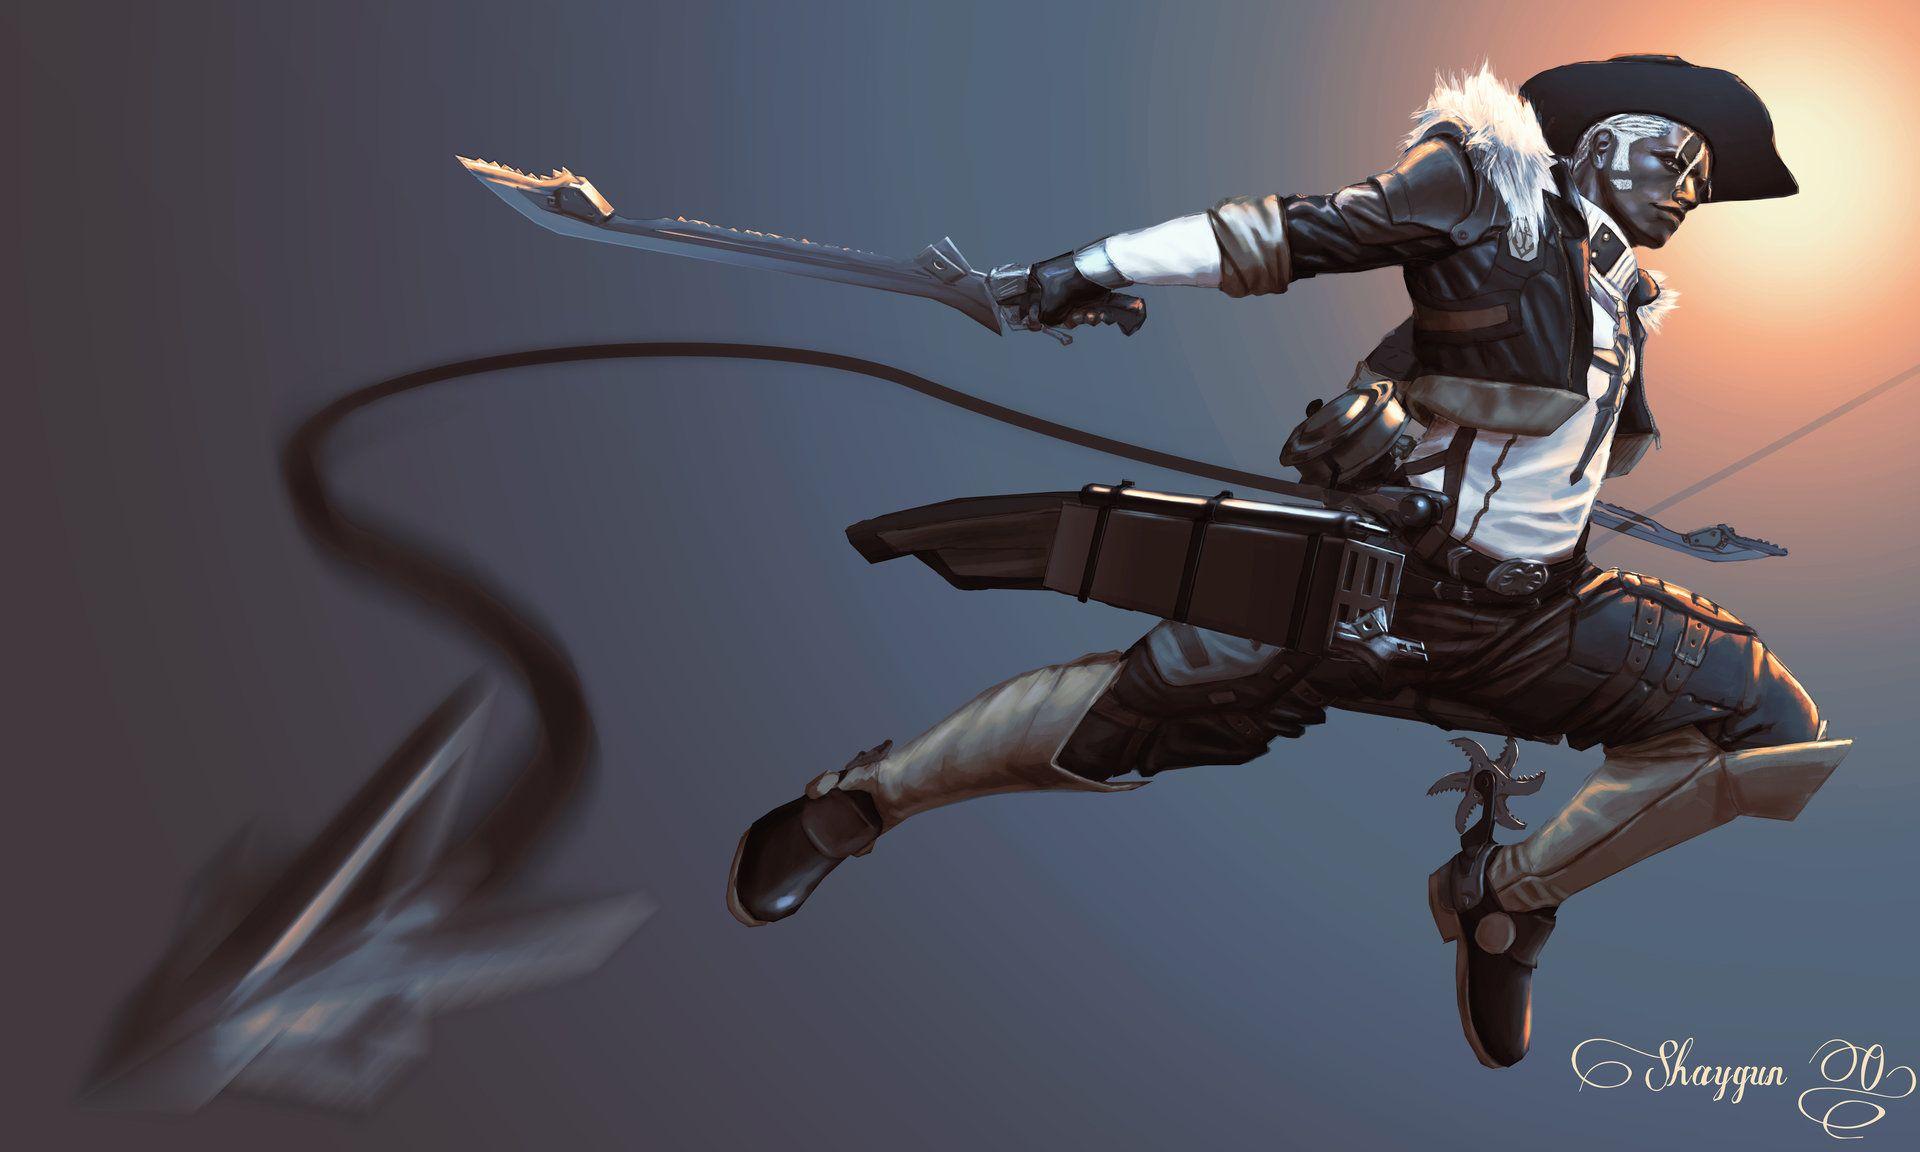 http://www.artstation.com/artwork/attack-on-titan-character